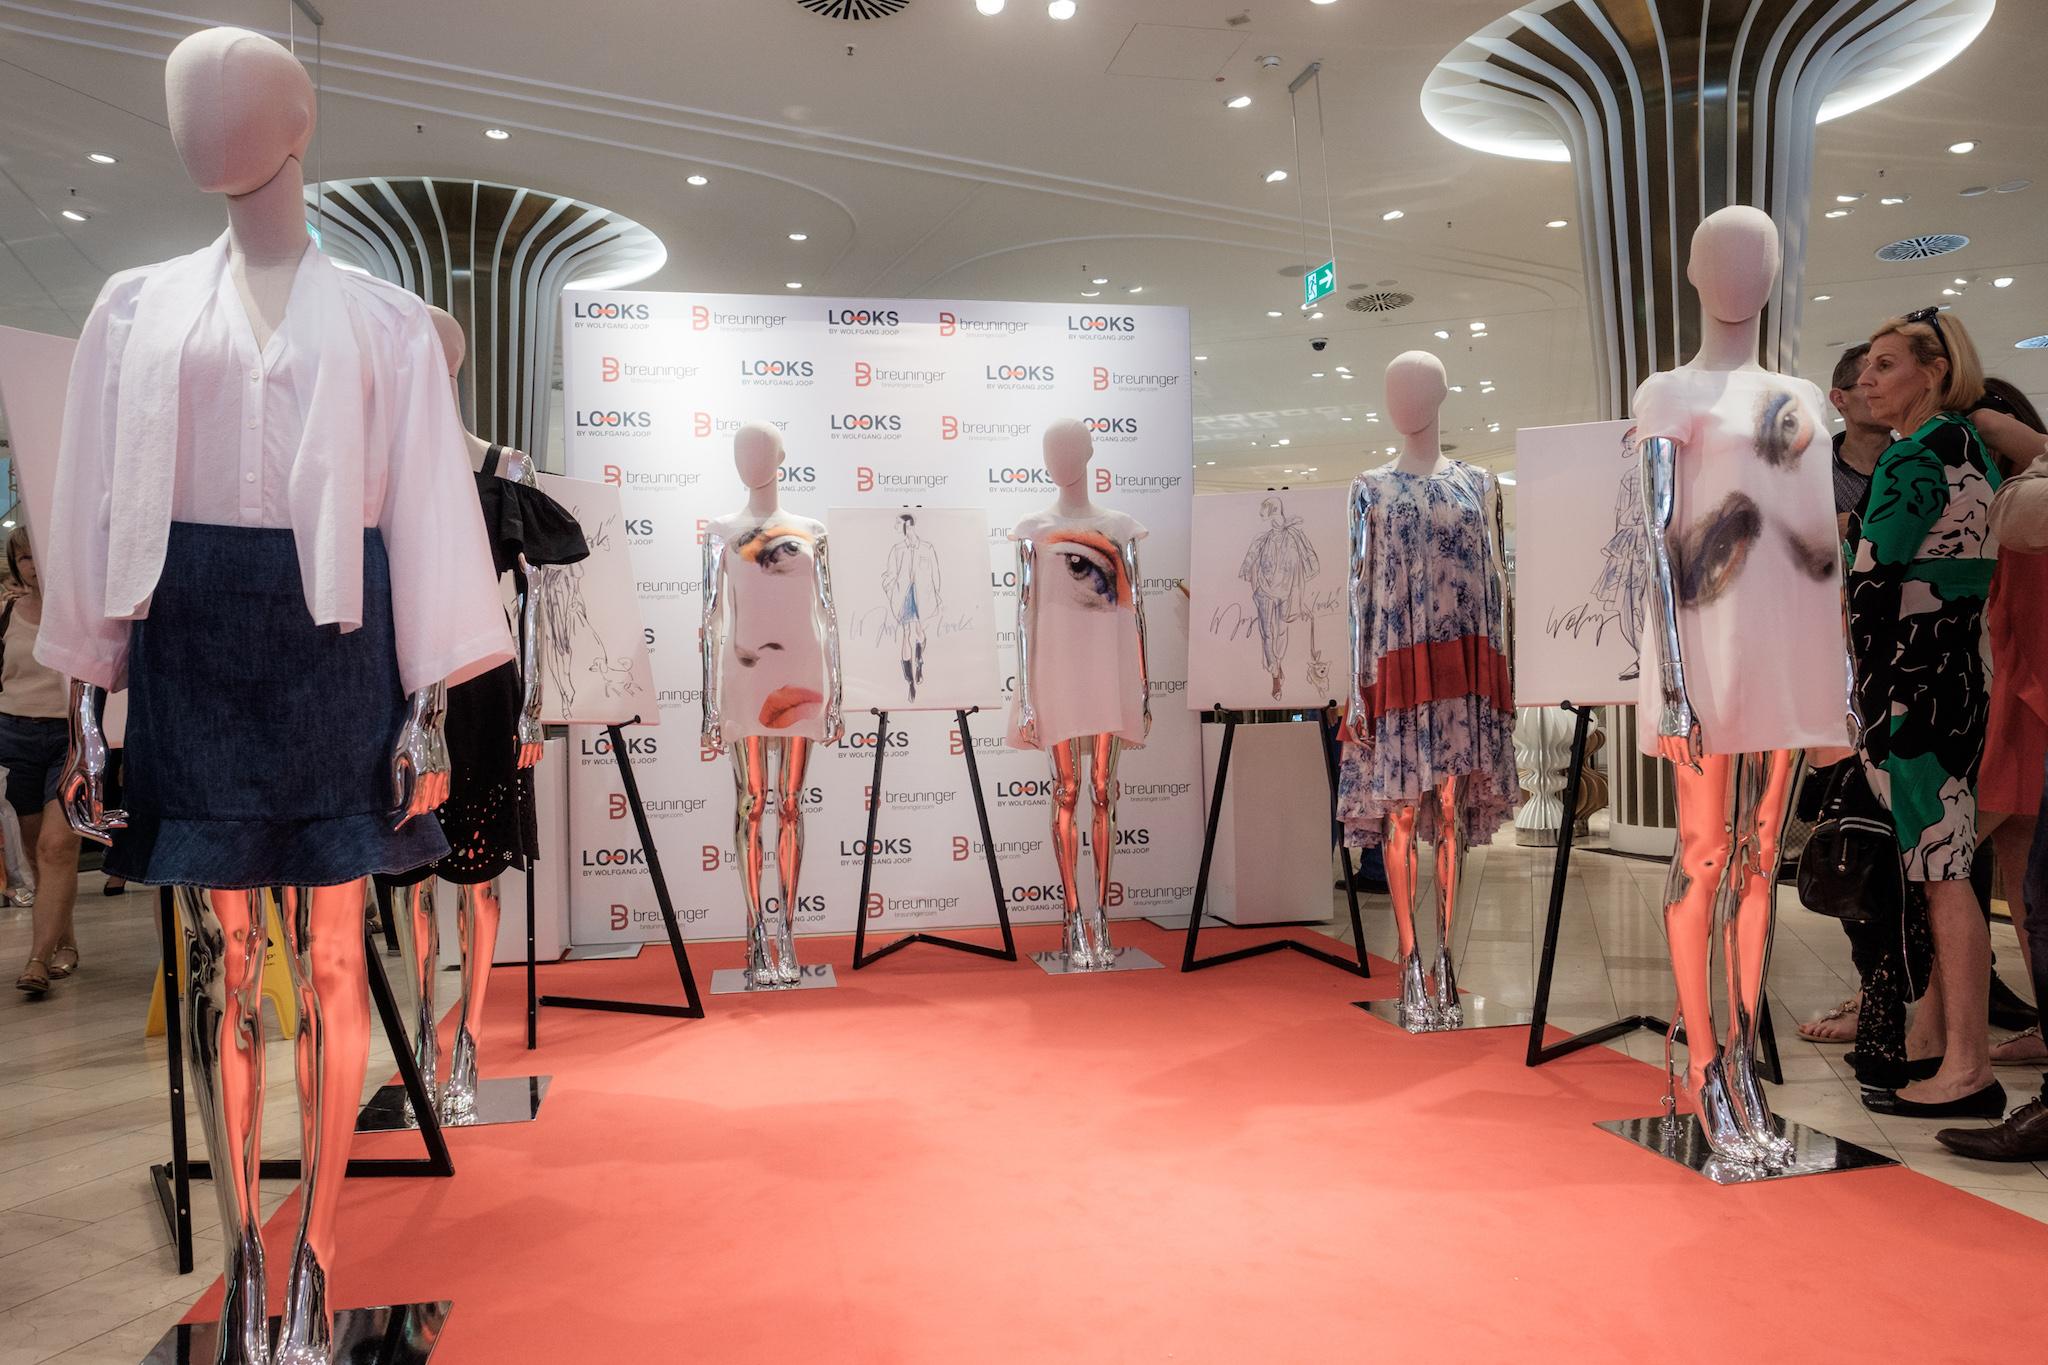 Wolfgang Joop Looks Collection, Joop reuninger, Looks Joop Breuninger, Looks Wolfgang Joop, Fashion-Blog, Lieblingsstil.com,jpg